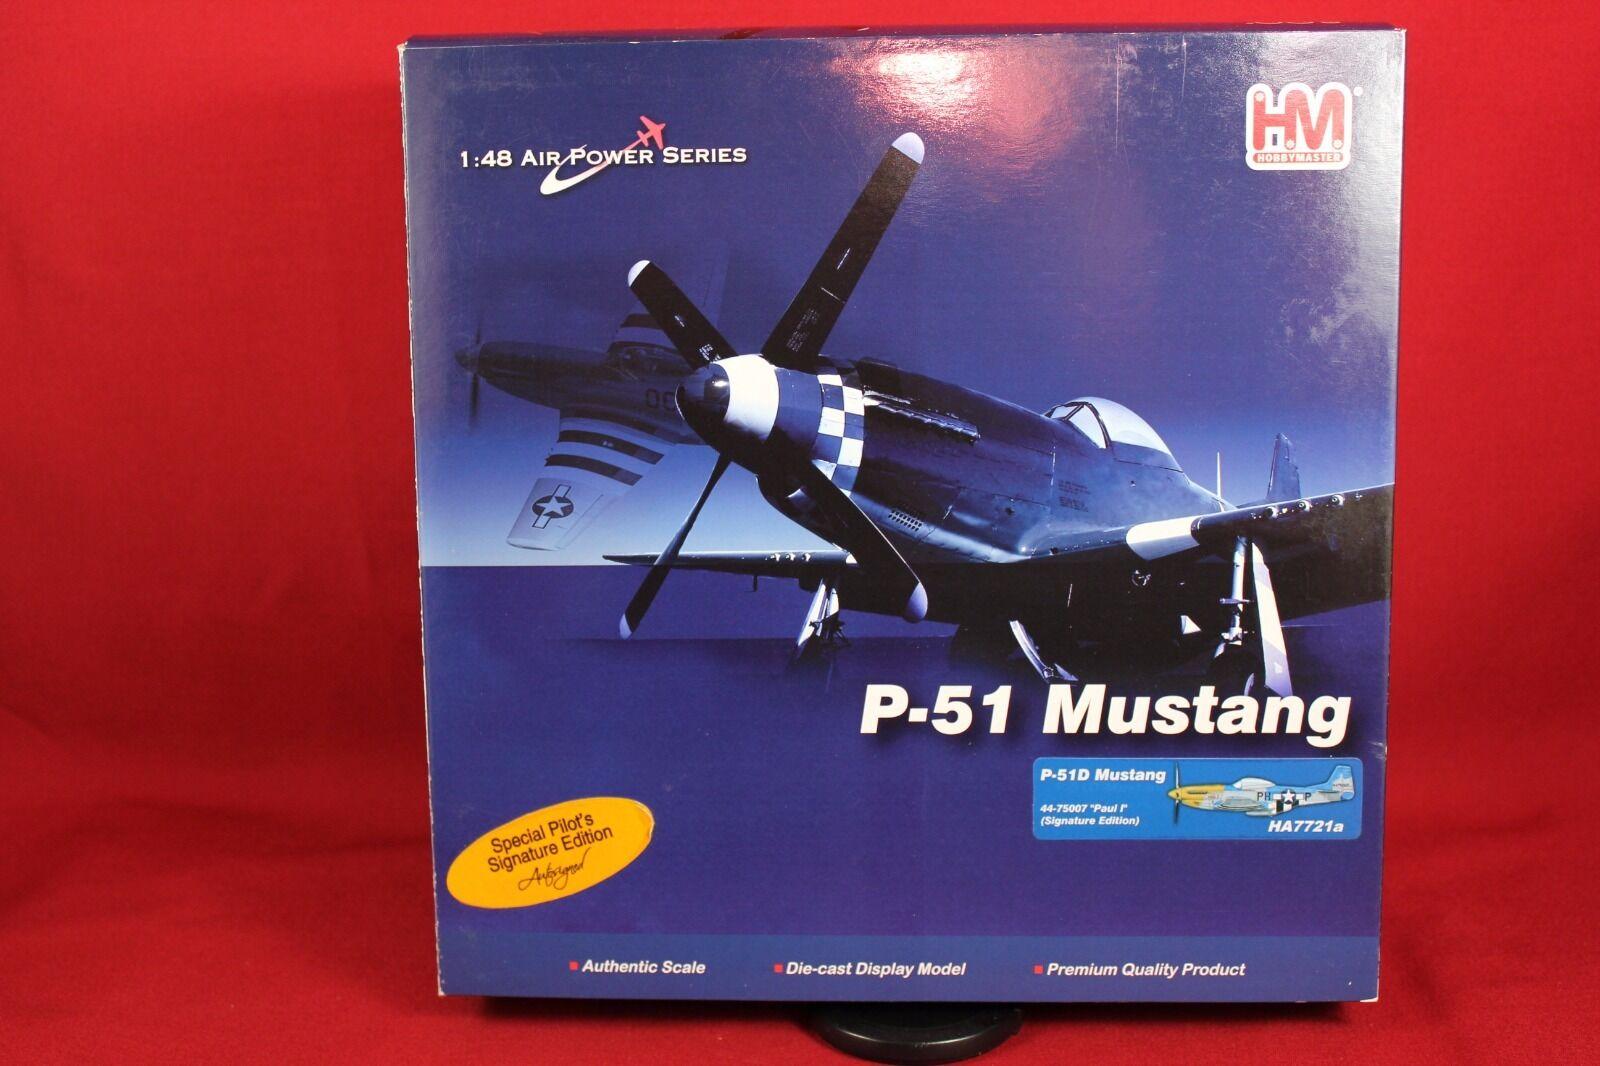 Hobby Master Signature Edition P-51D pantalla y coleccionista de Mustang modelo HA7721a